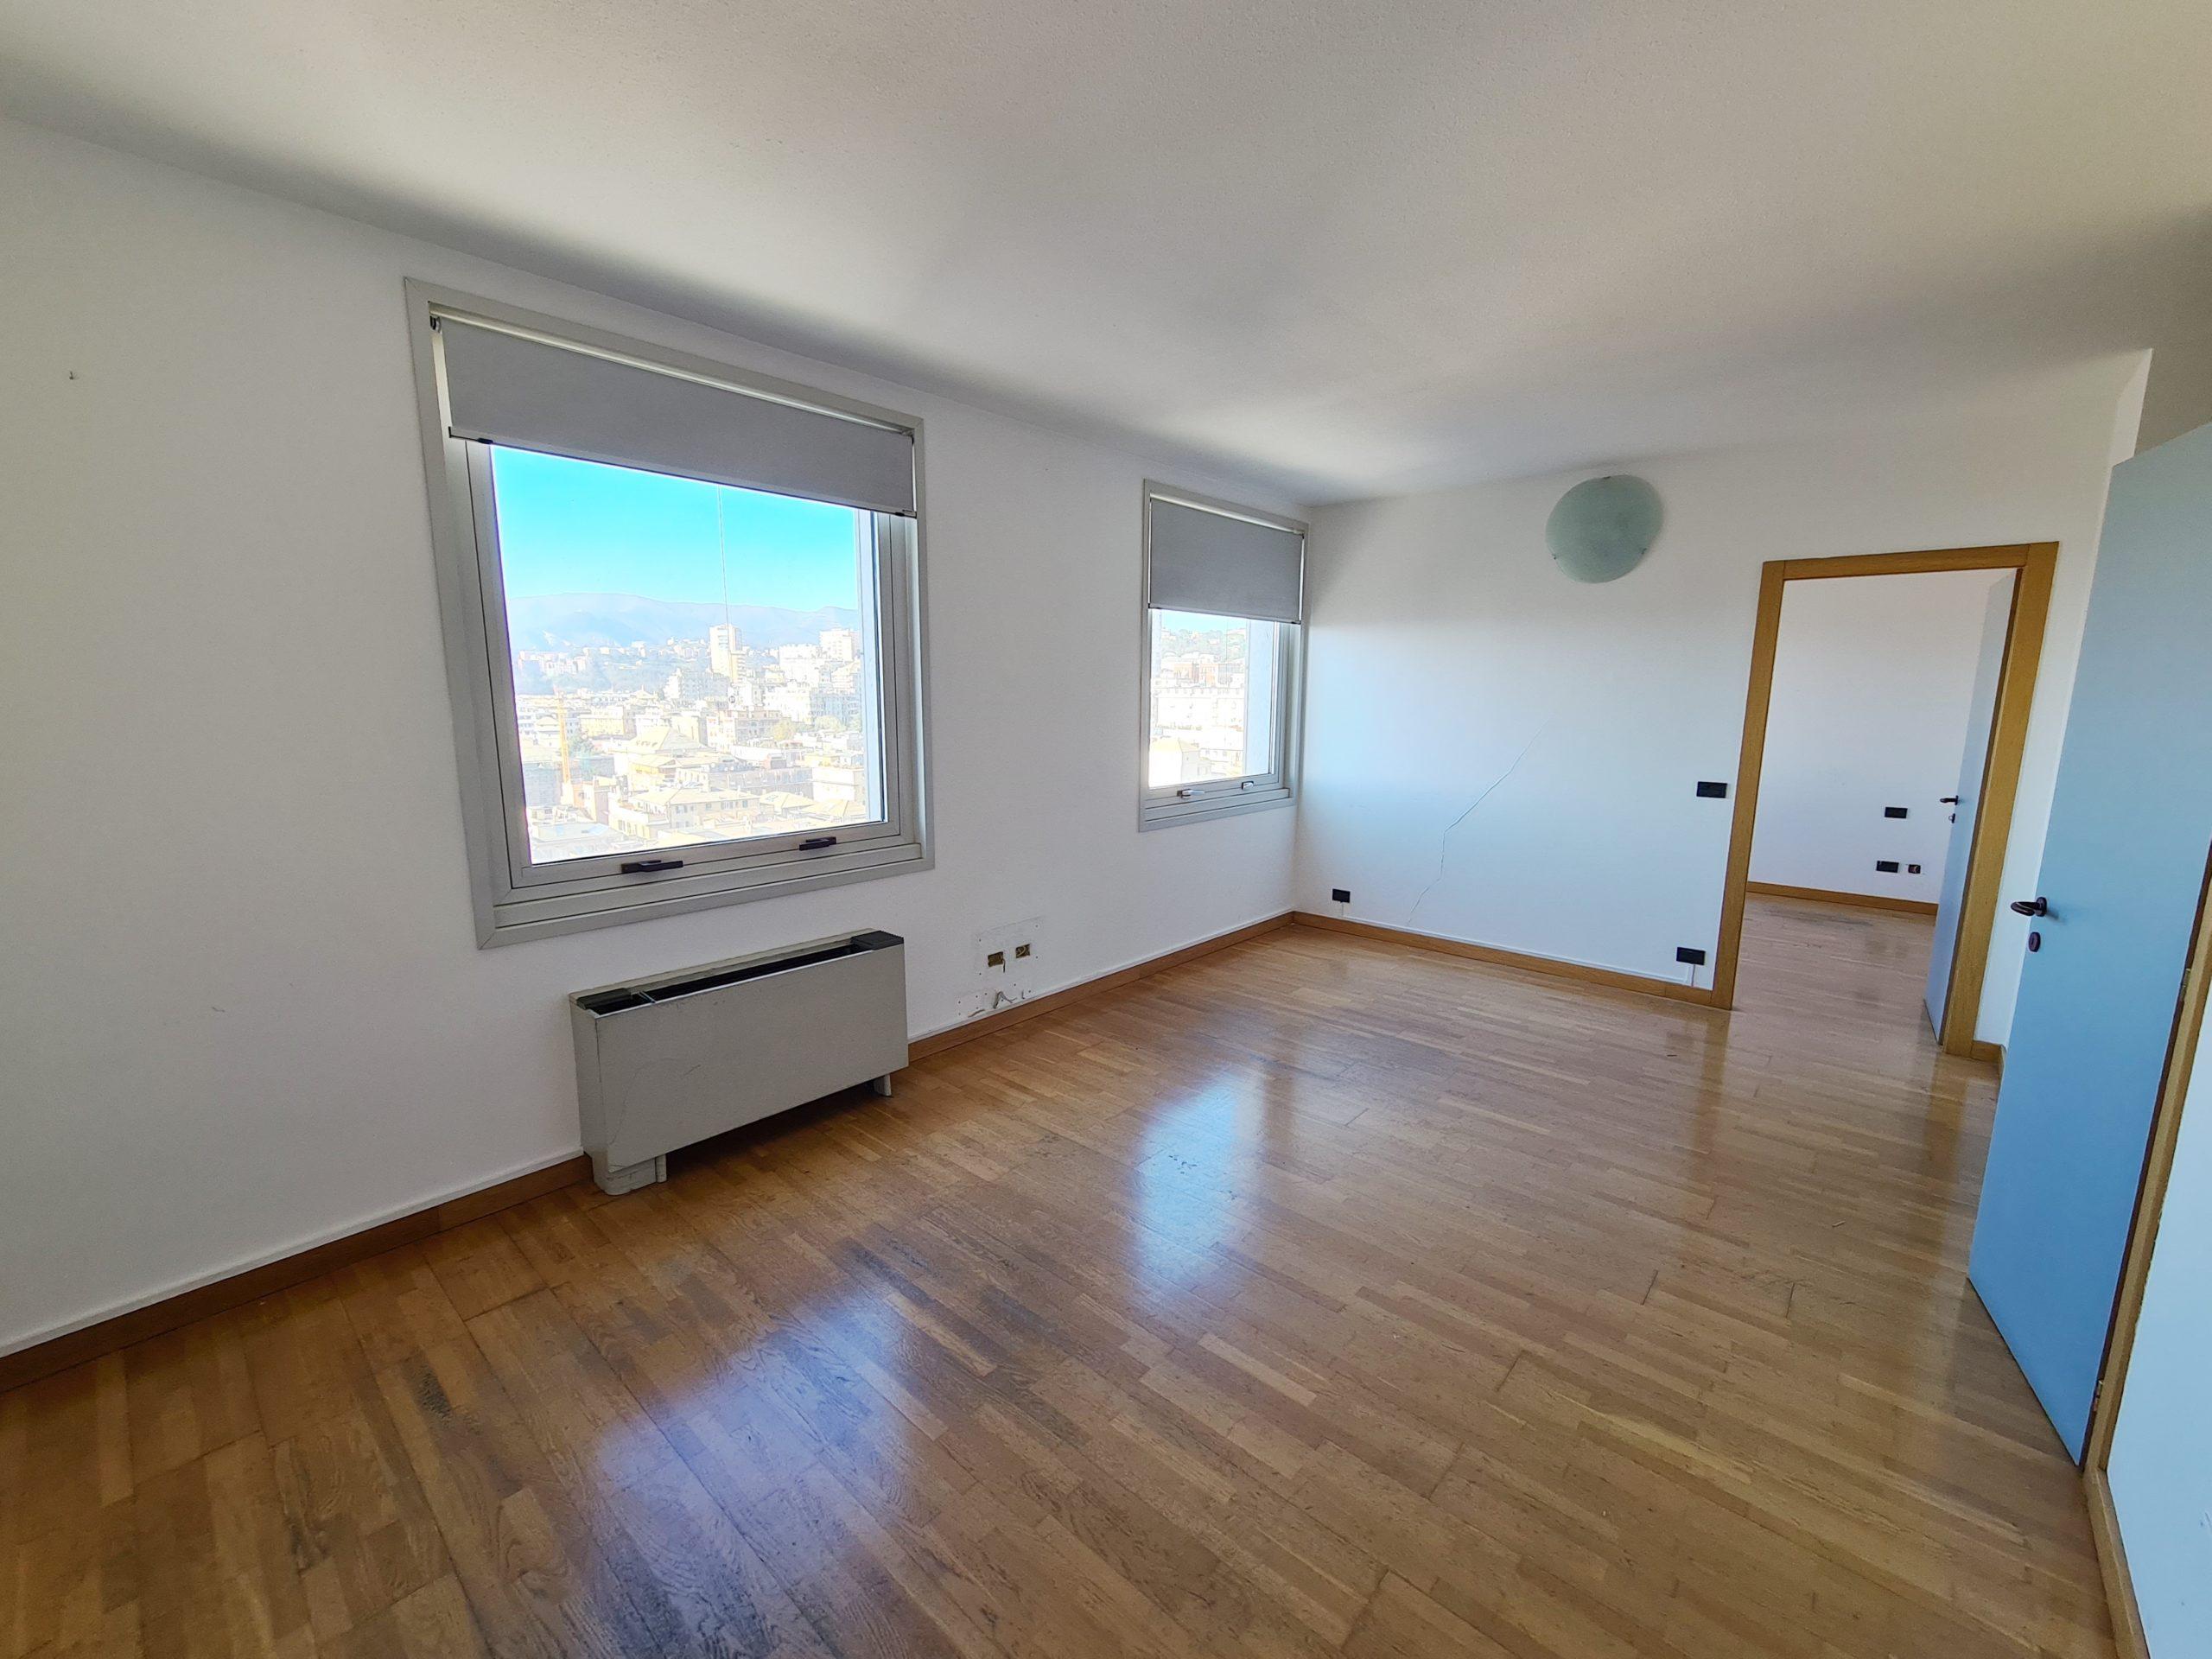 SAN BENIGNO (WTC) vendesi elegante trilocale panoramico